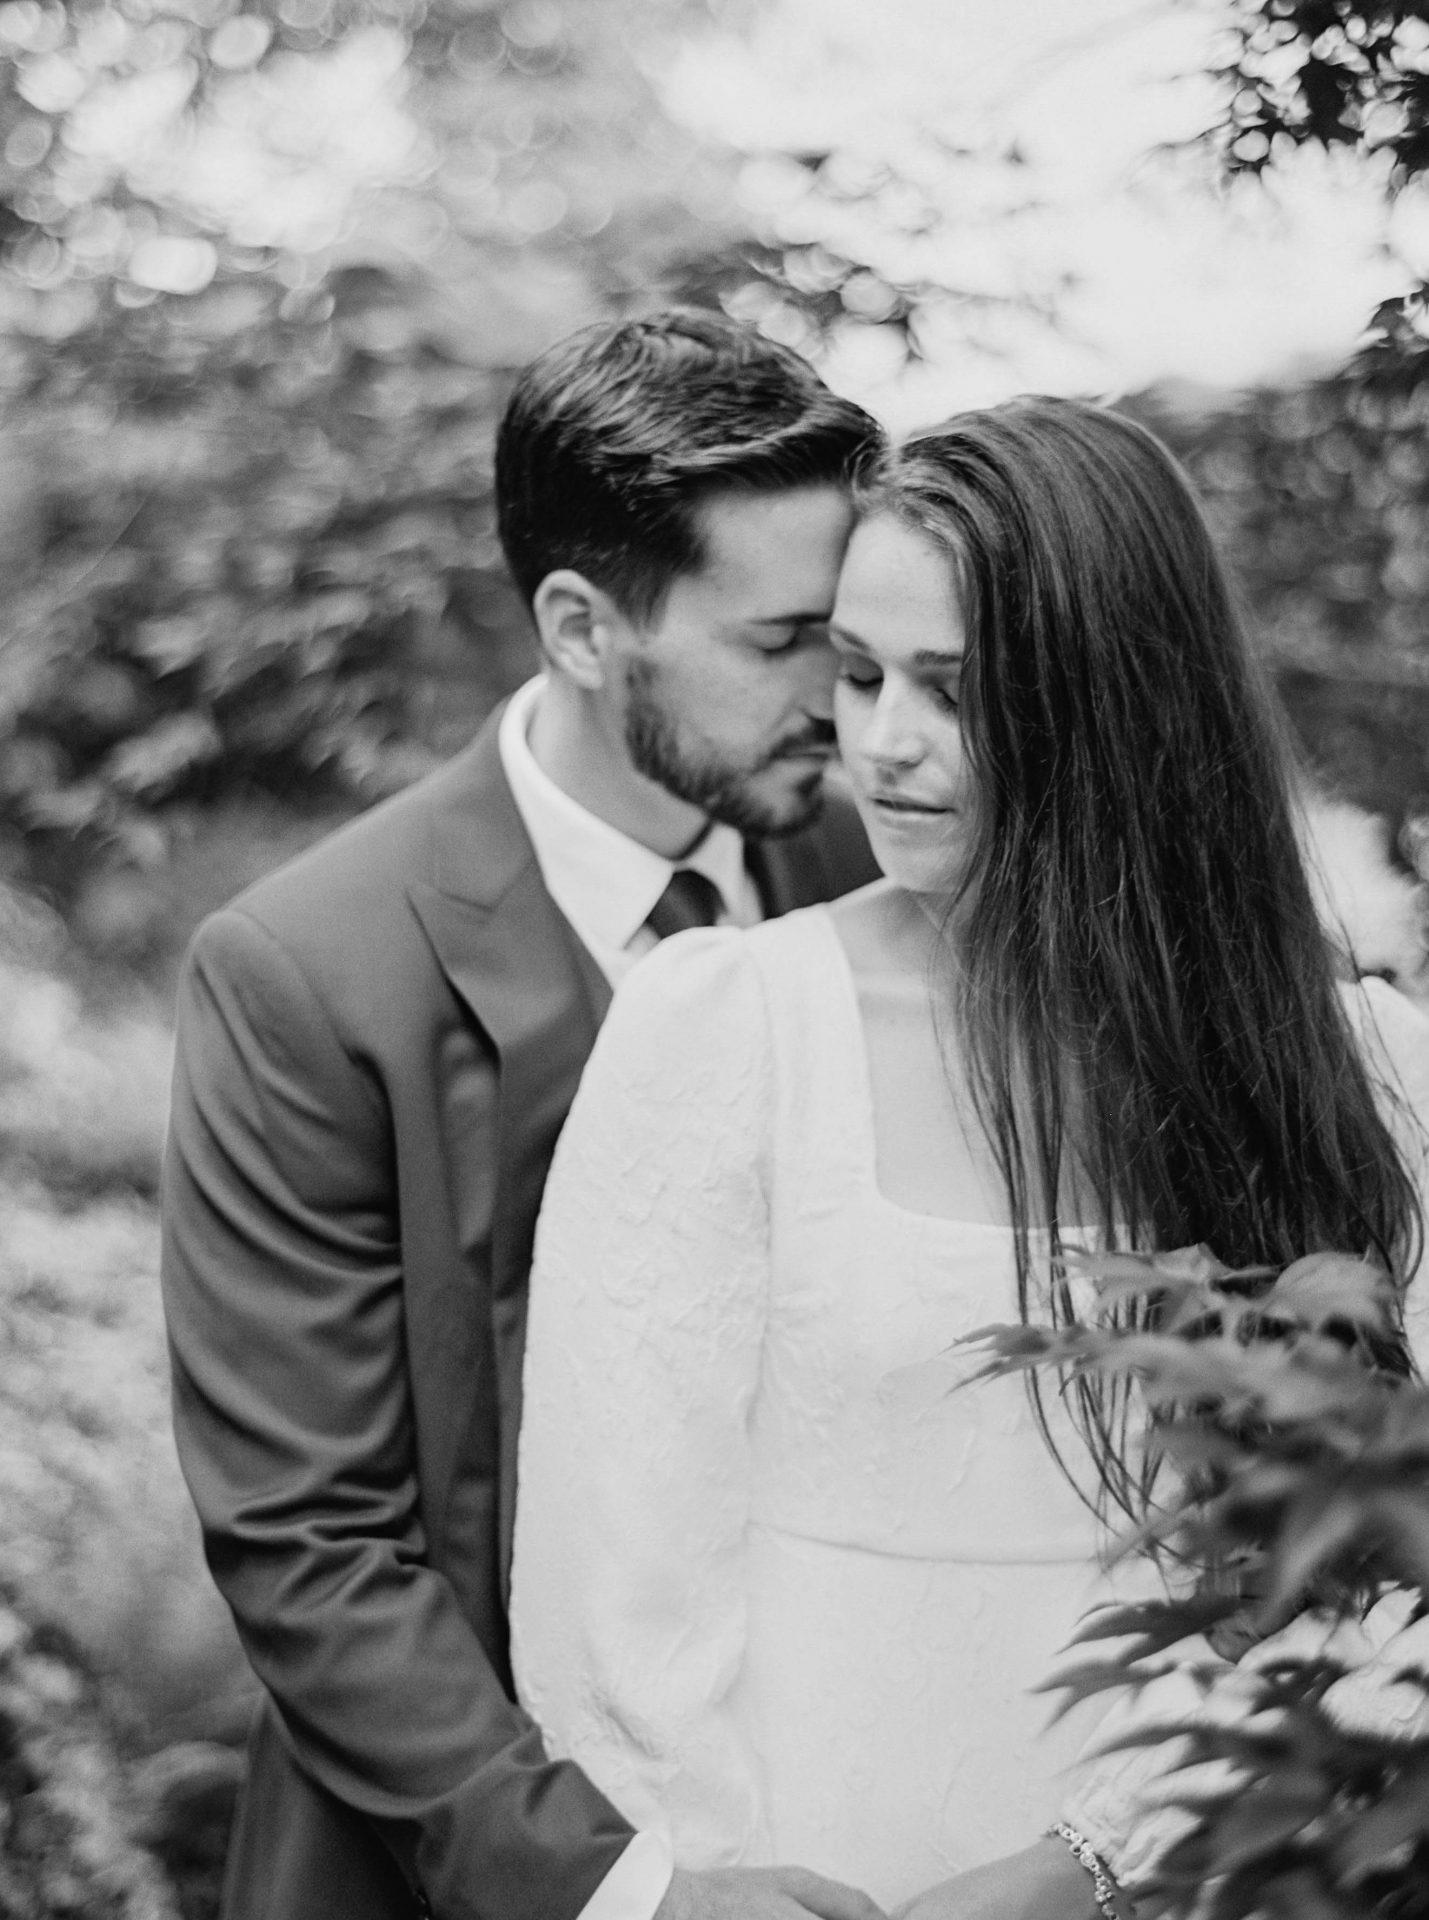 The Greystone Inn, Lake Toxaway, Wedding North Carolina lake, Greystone Inn Wedding Photos, North Carolina Wedding Photographer, Engagement Lake Toxaway, Greystone Inn Lake Wedding, Taralynn and Kyle, Amanda Castle Photography,